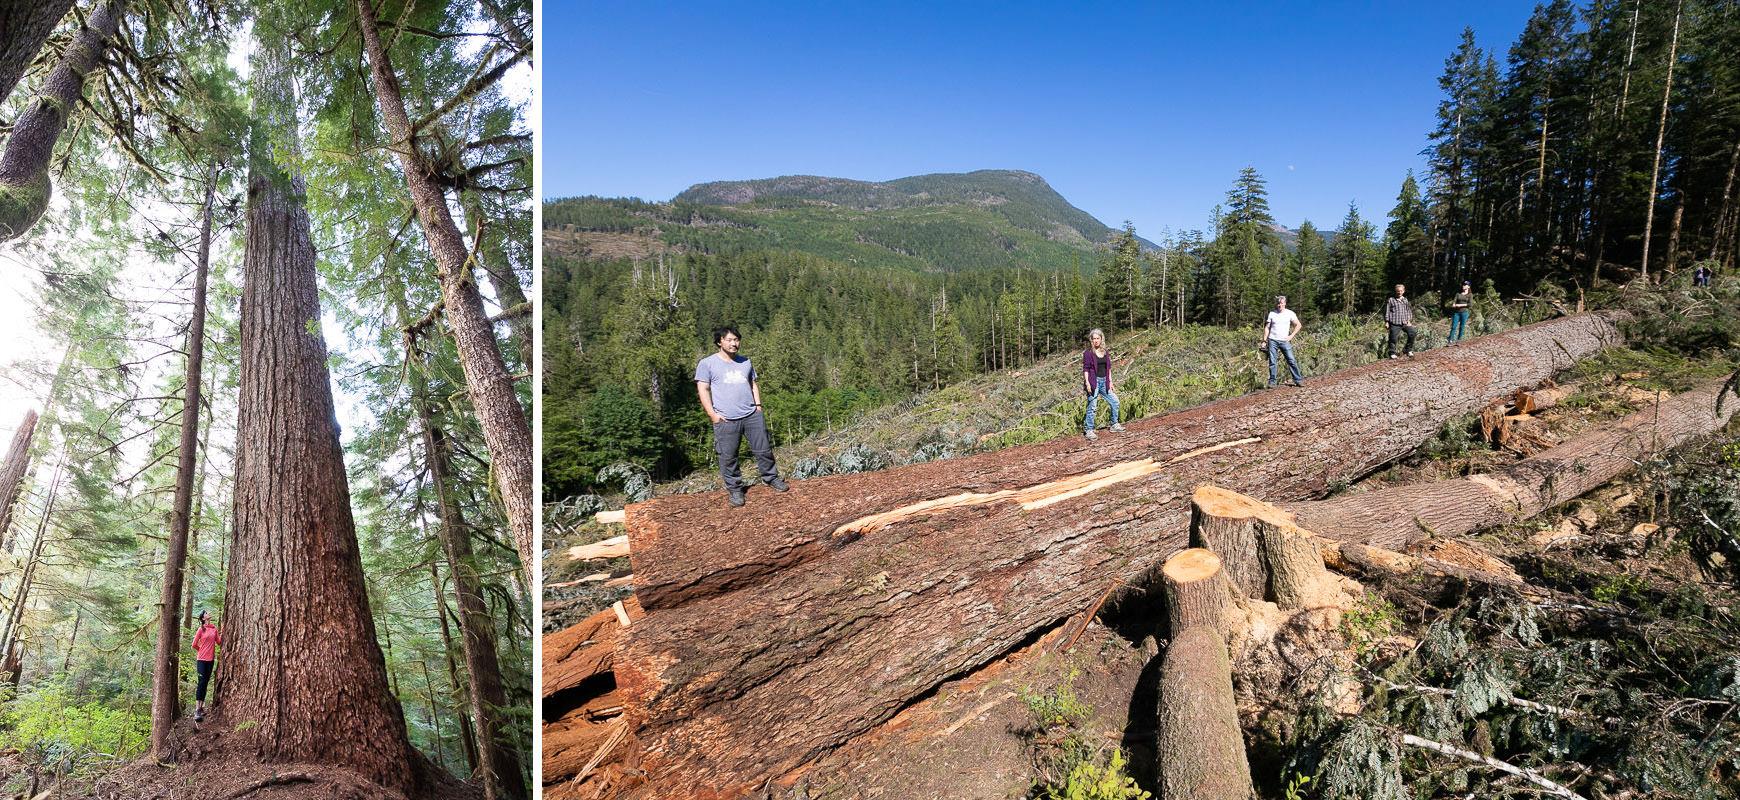 Before-After-logging-big-fir-tree-nahmint-valley-2.jpg